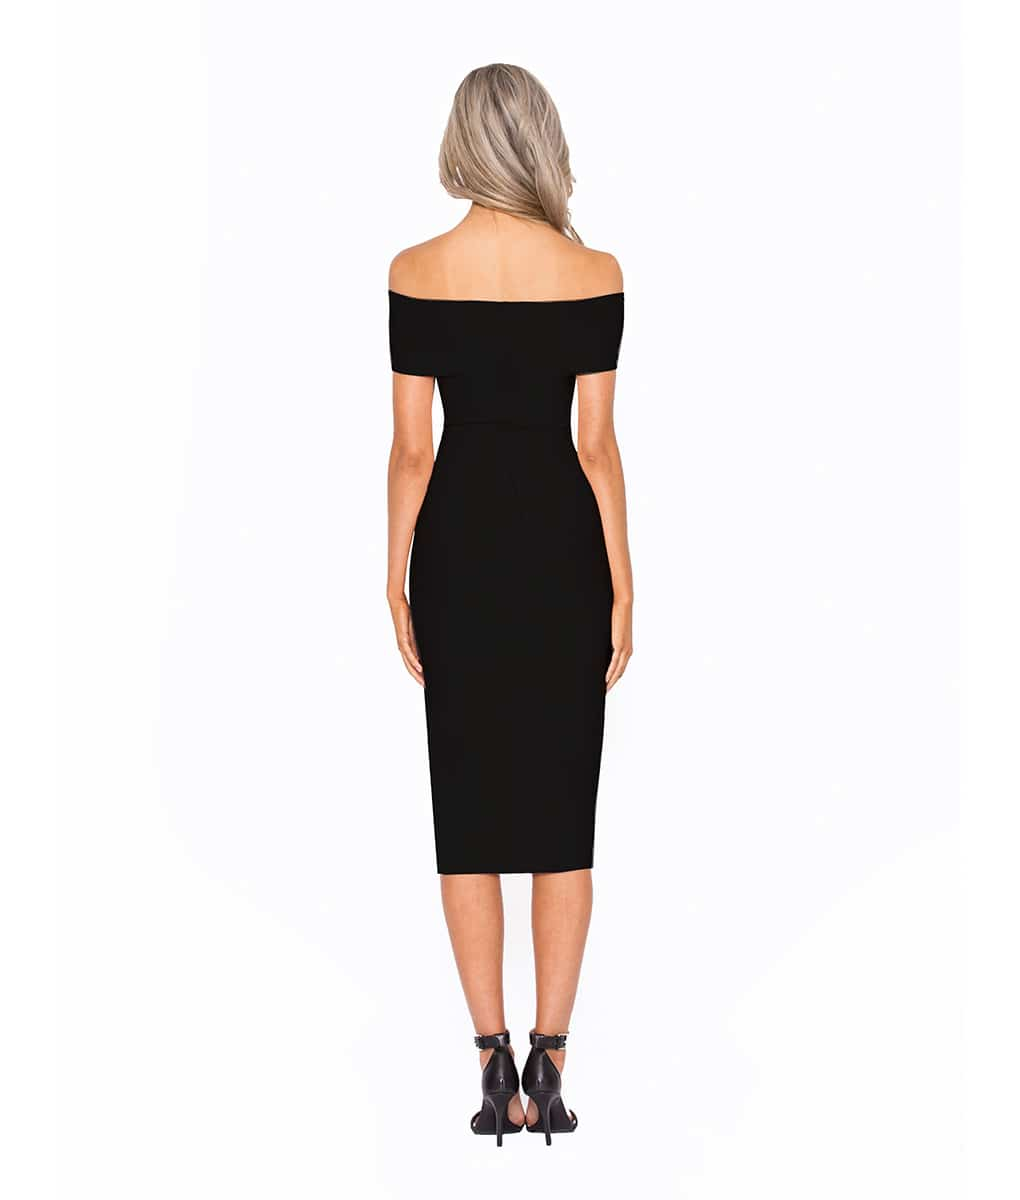 Alila-Bardot-neck-Black-Bodycon-Midi-Dress-Bariano